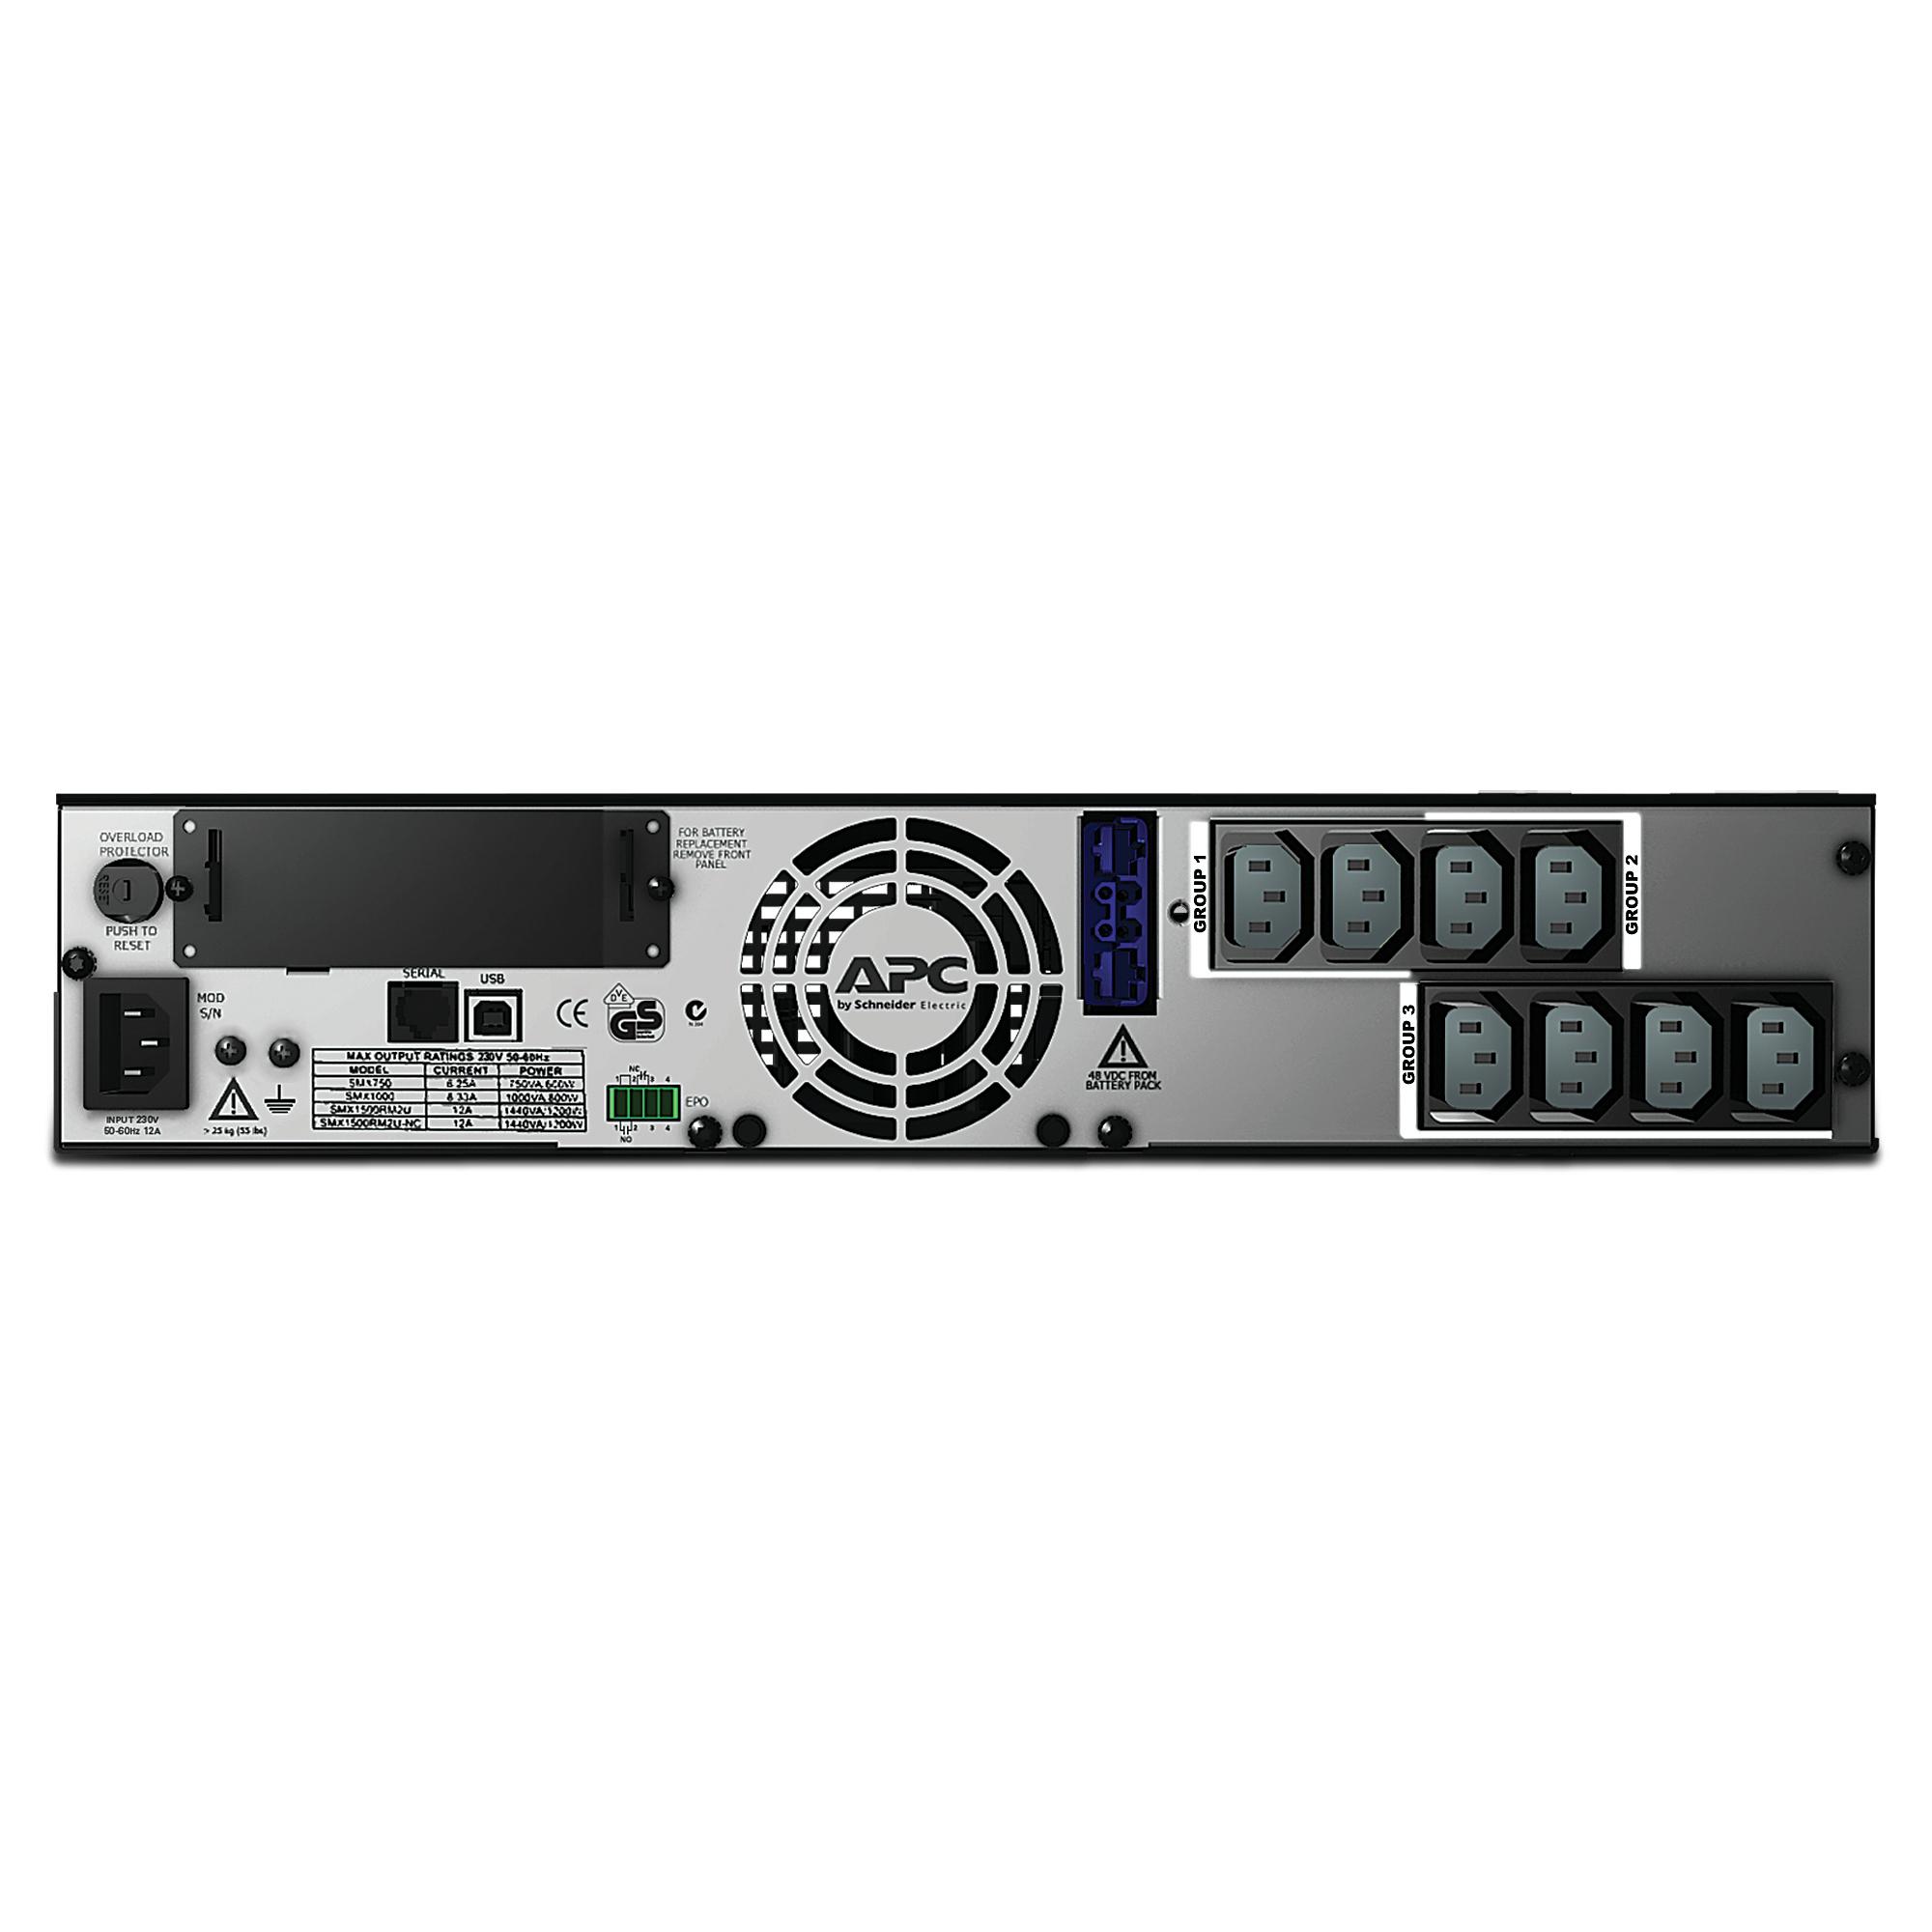 SMX1500RMI2U Smart-UPS X (1500 VA, Rack/Tower, LCD, rack-mountable, 1200 Watt, 1500 VA, RS-232, USB, 8 output connectors, 2U)